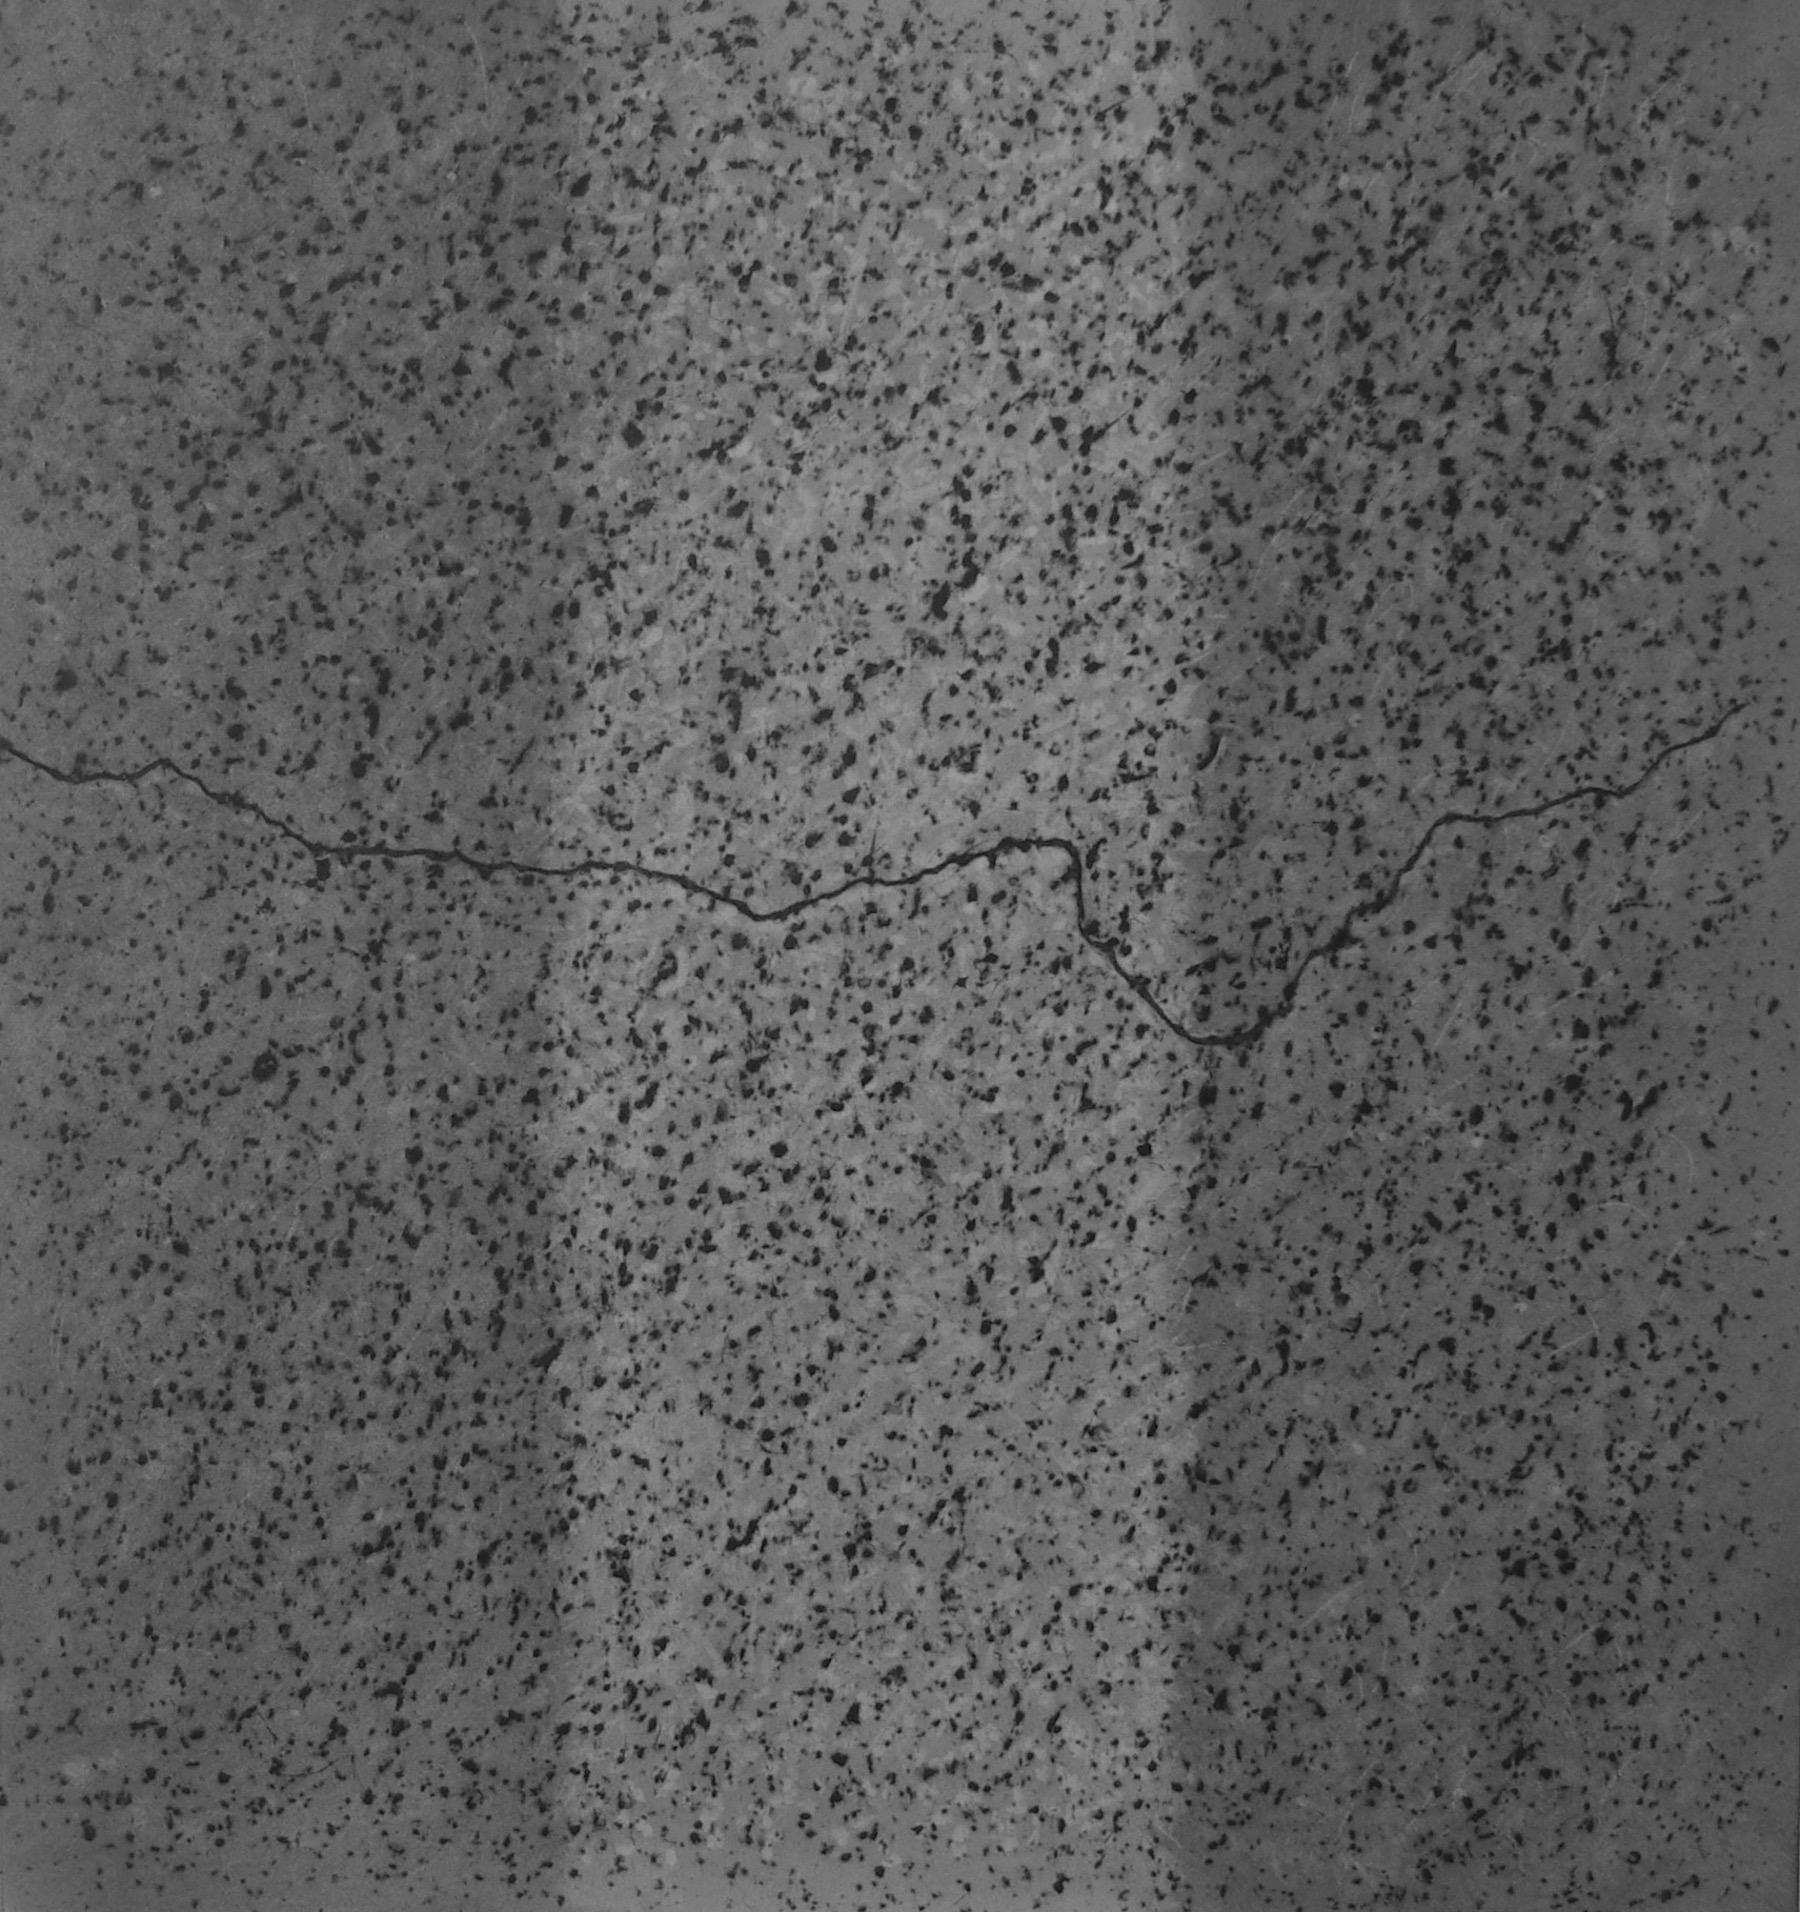 Charles Ramsburg, Shadows VIII, 20117, Charcoal on Paper, 16x15inches.jpg